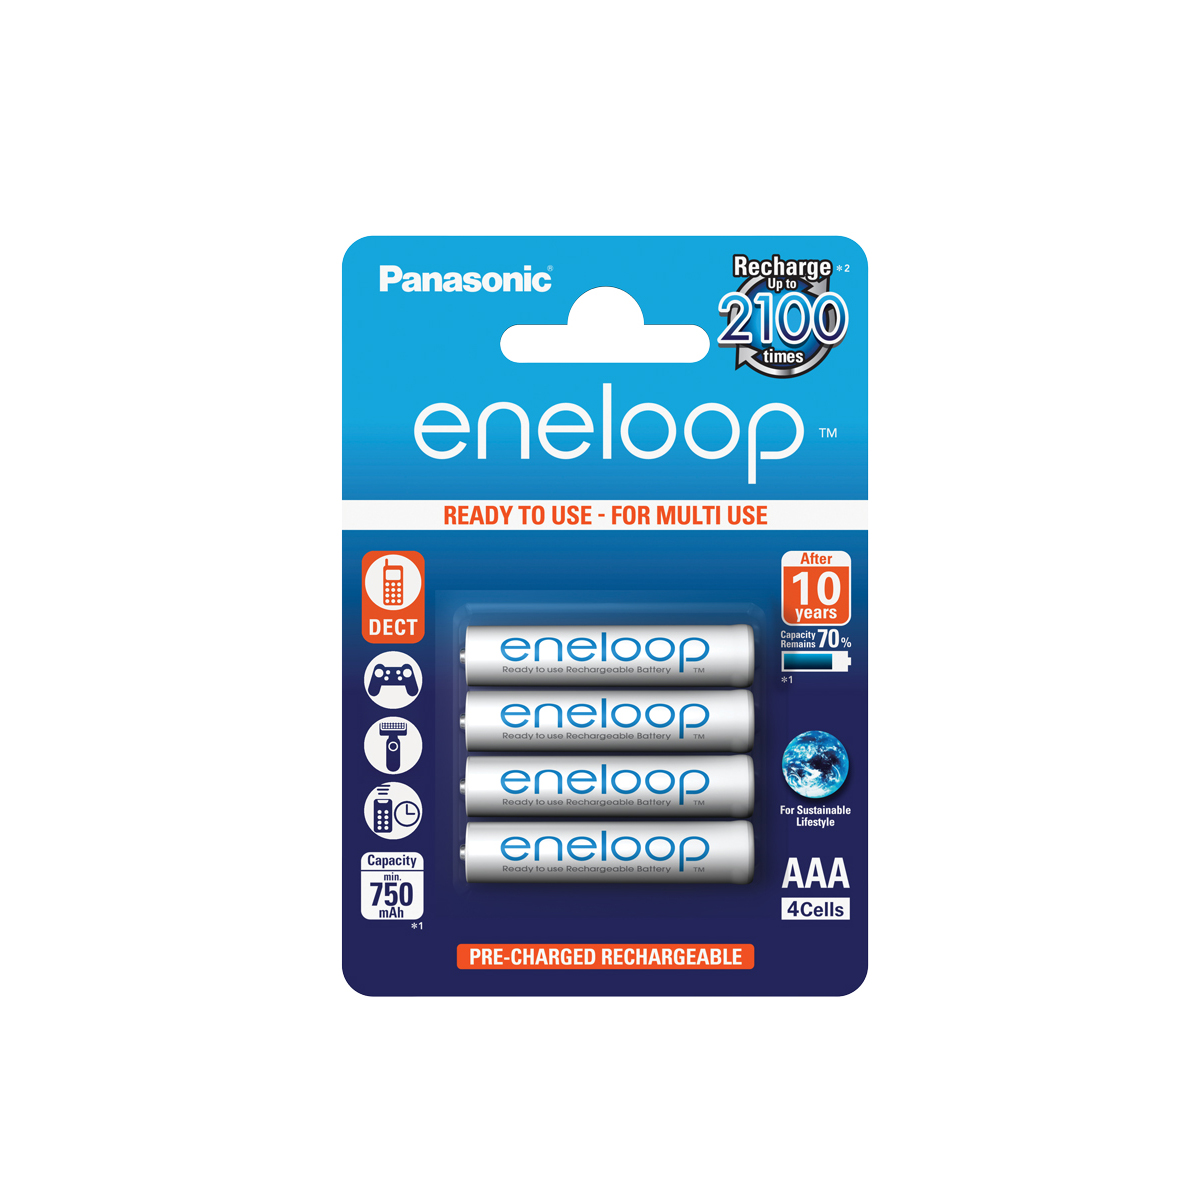 Panasonic Eneloop AAA BL4